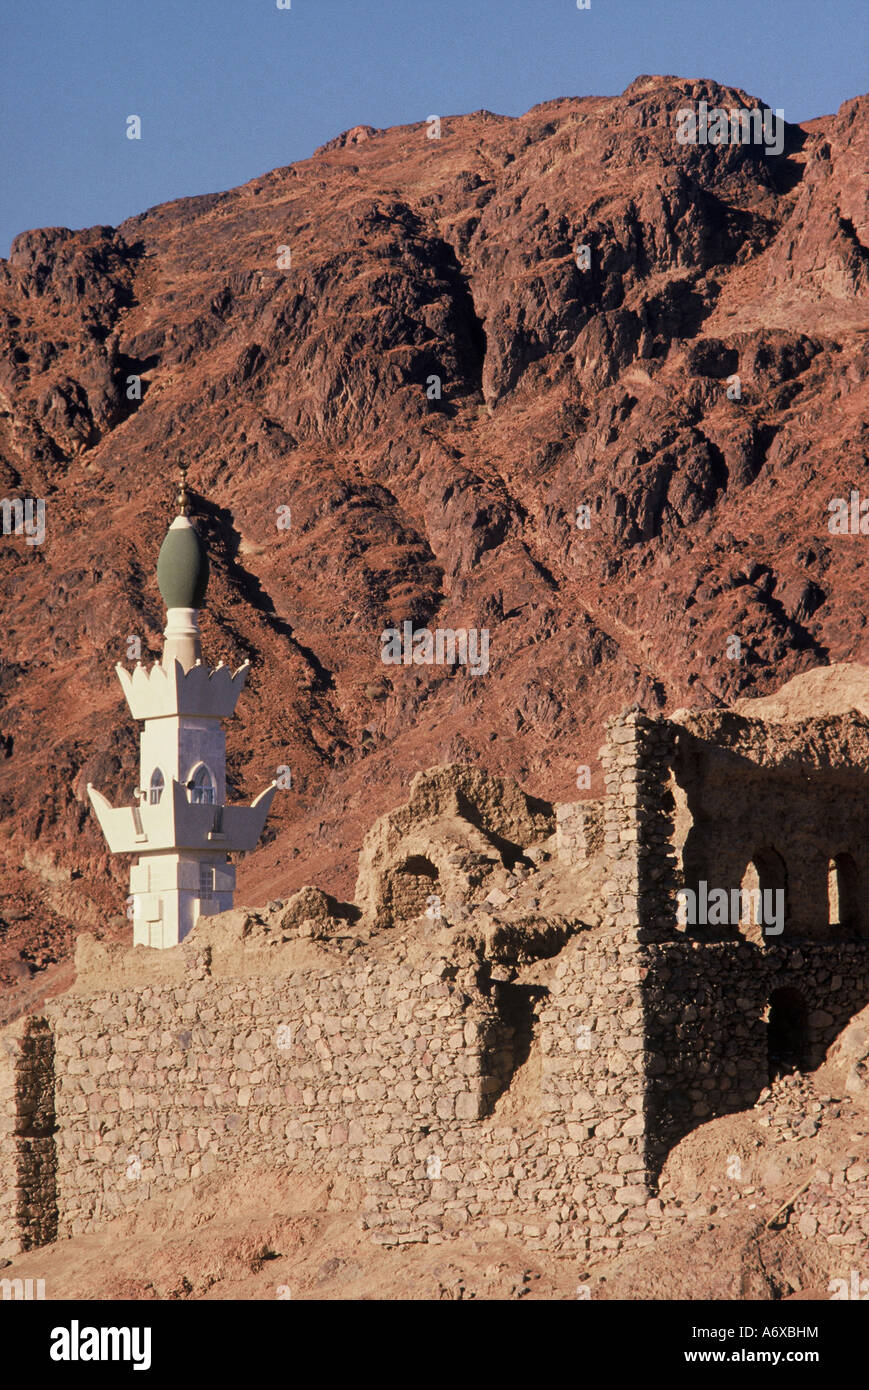 Jebel Uhud Madinah Saudia Arabia - Stock Image